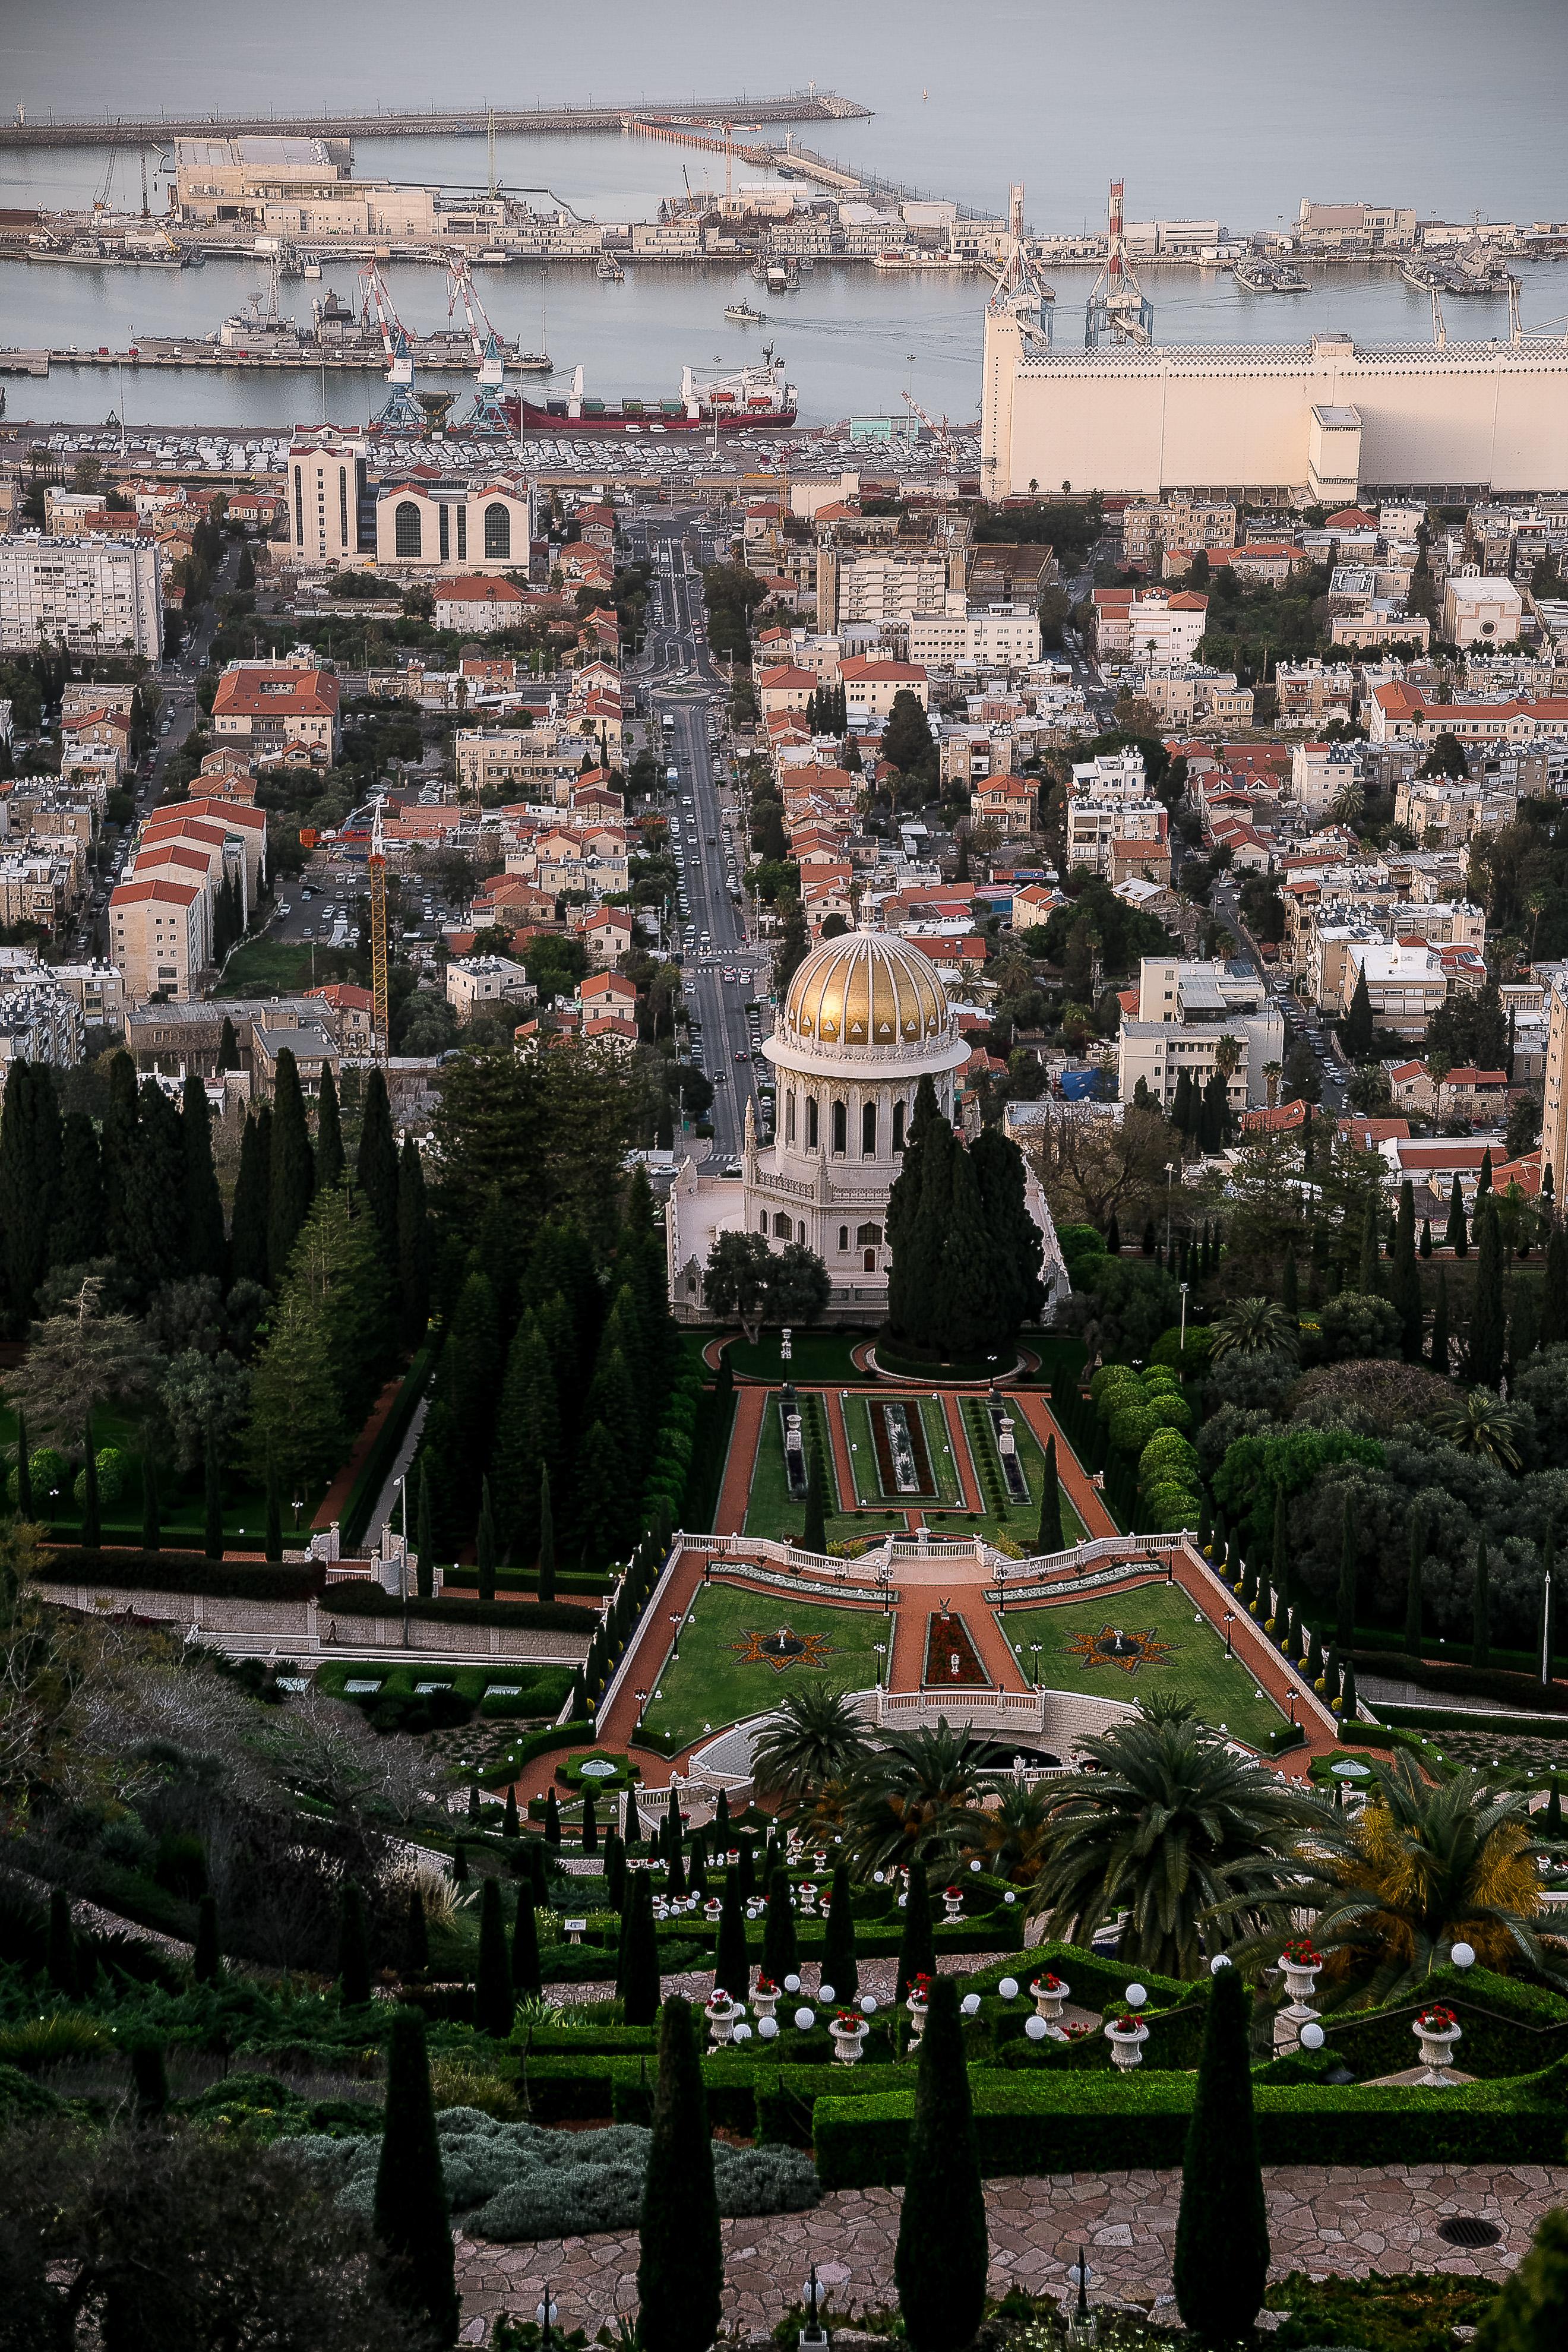 Baha'i Gardens | Visit Israel: Haifa mini guide | on Due fili d'erba | by Thais FK & Klaus K.